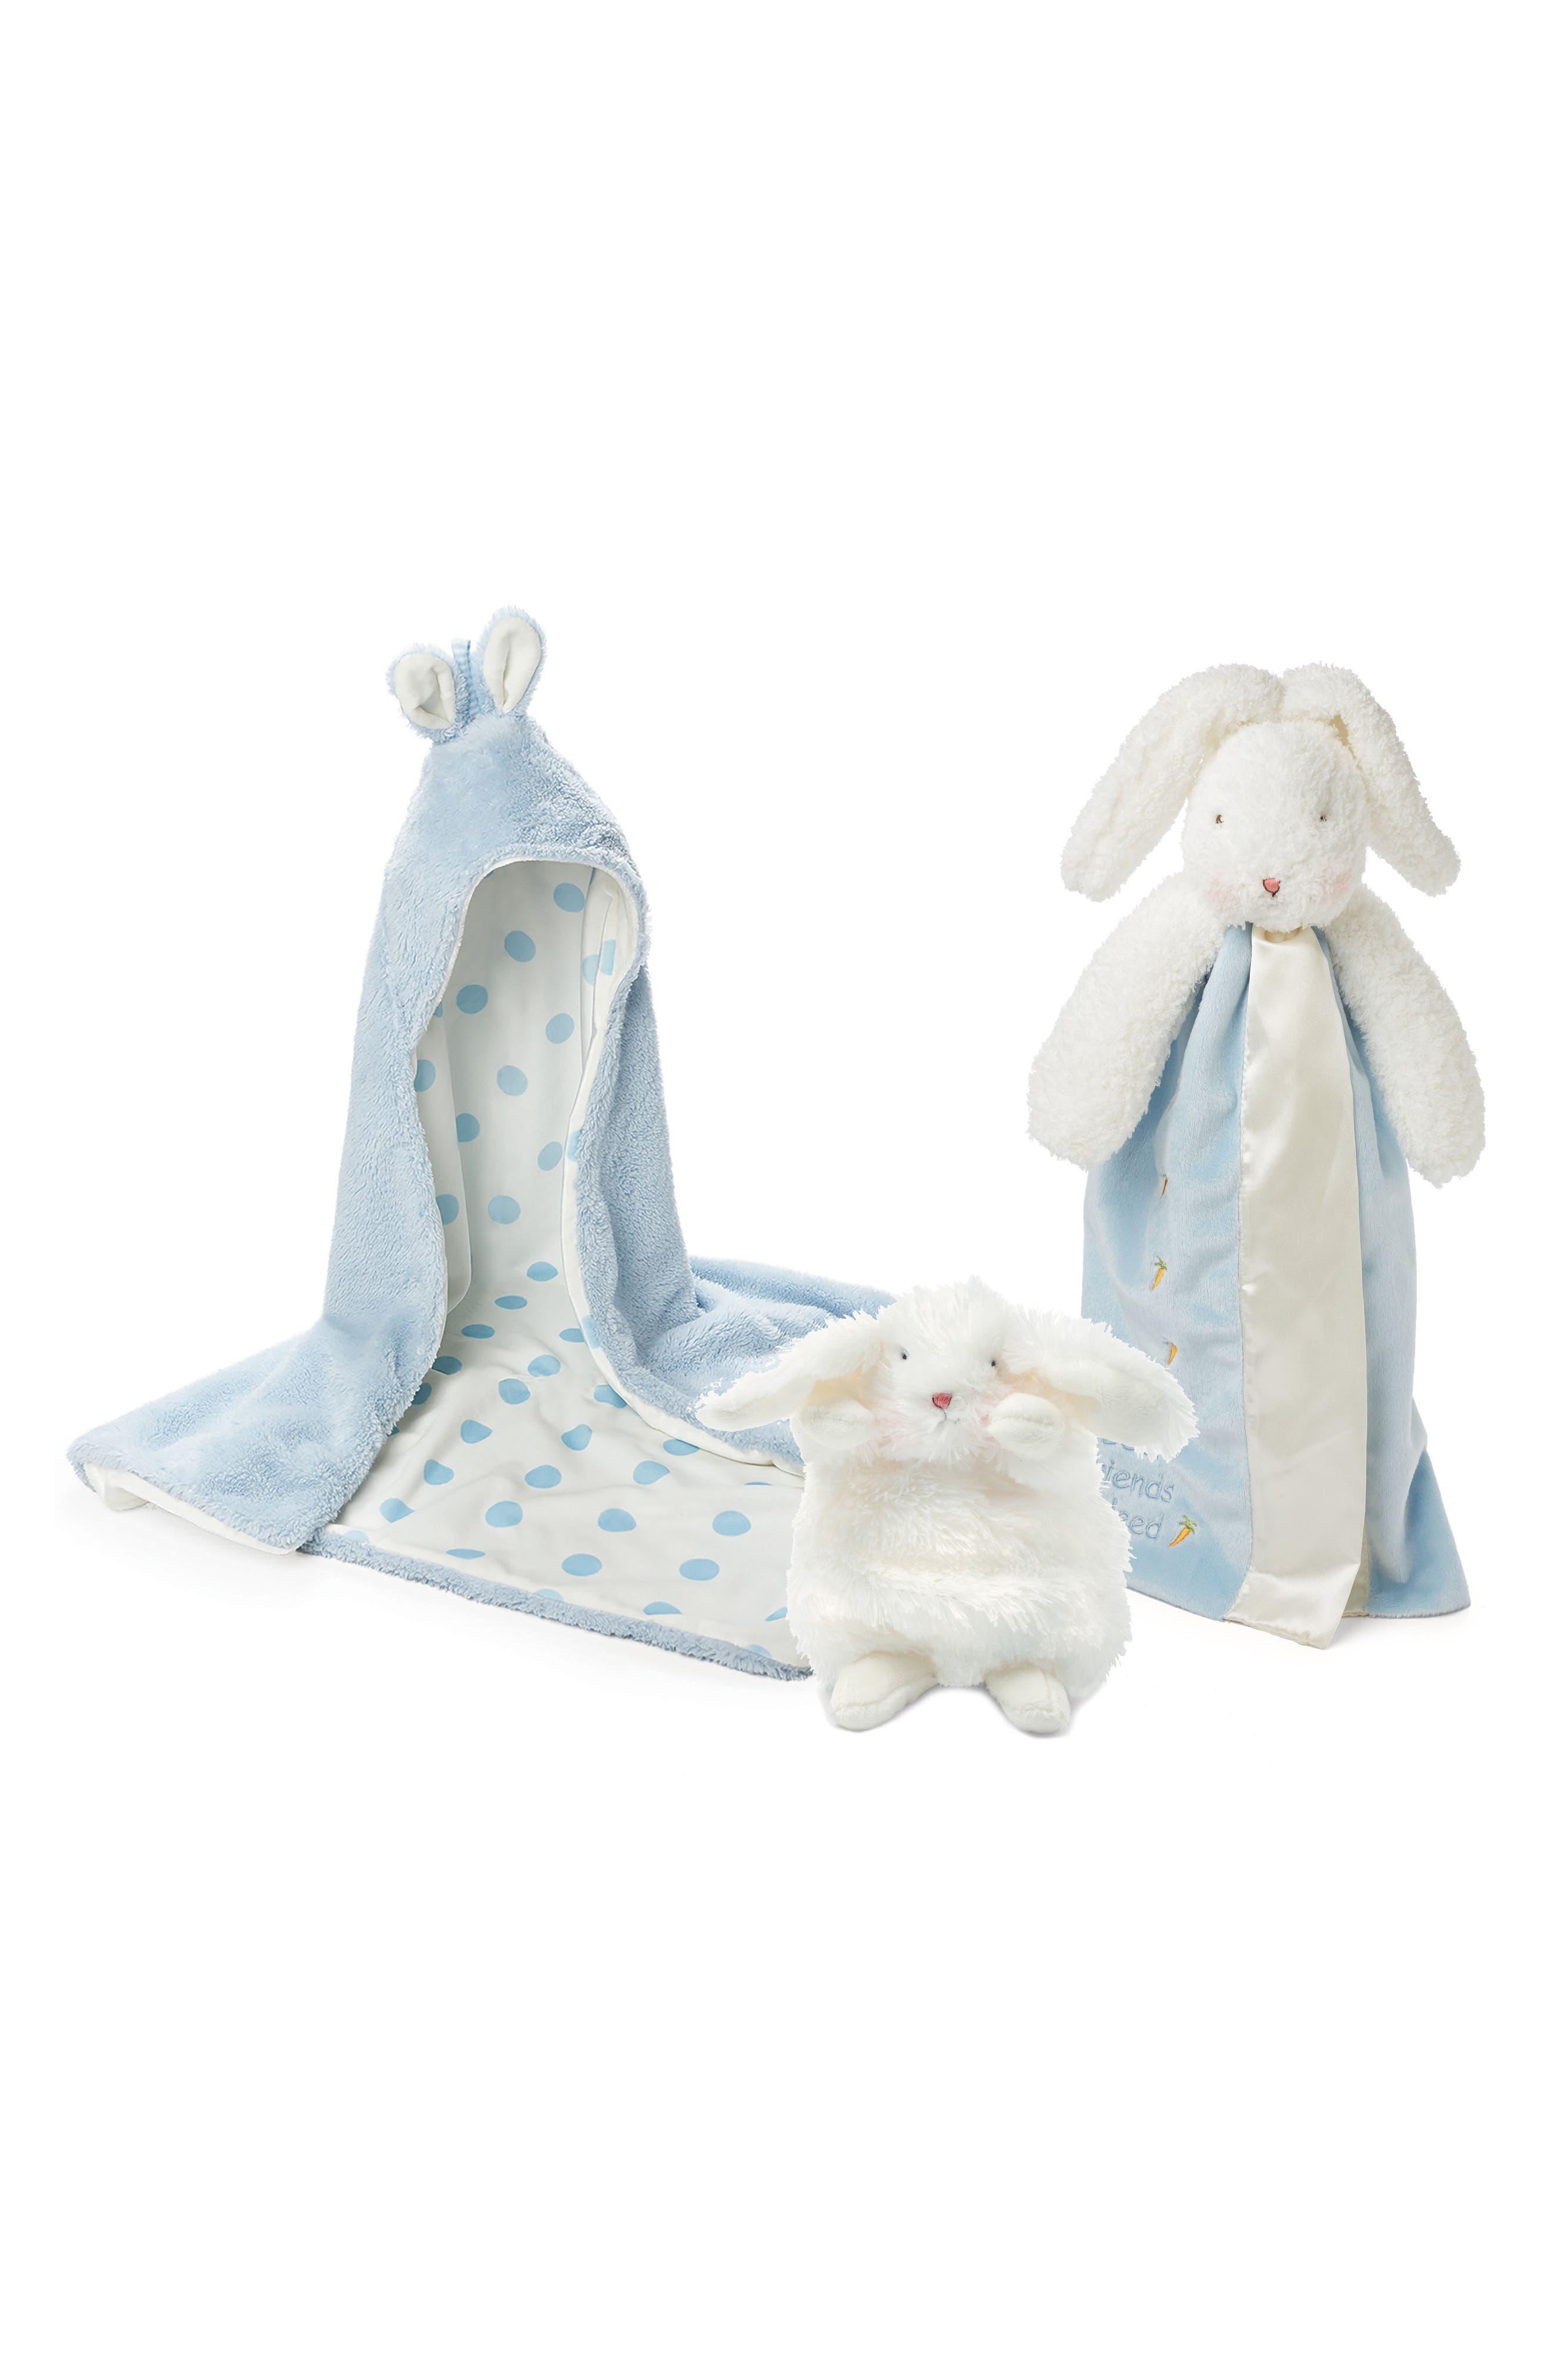 Main Image - Bunnies by the Bay Hooded Blanket, Lovie & Stuffed Animal Set